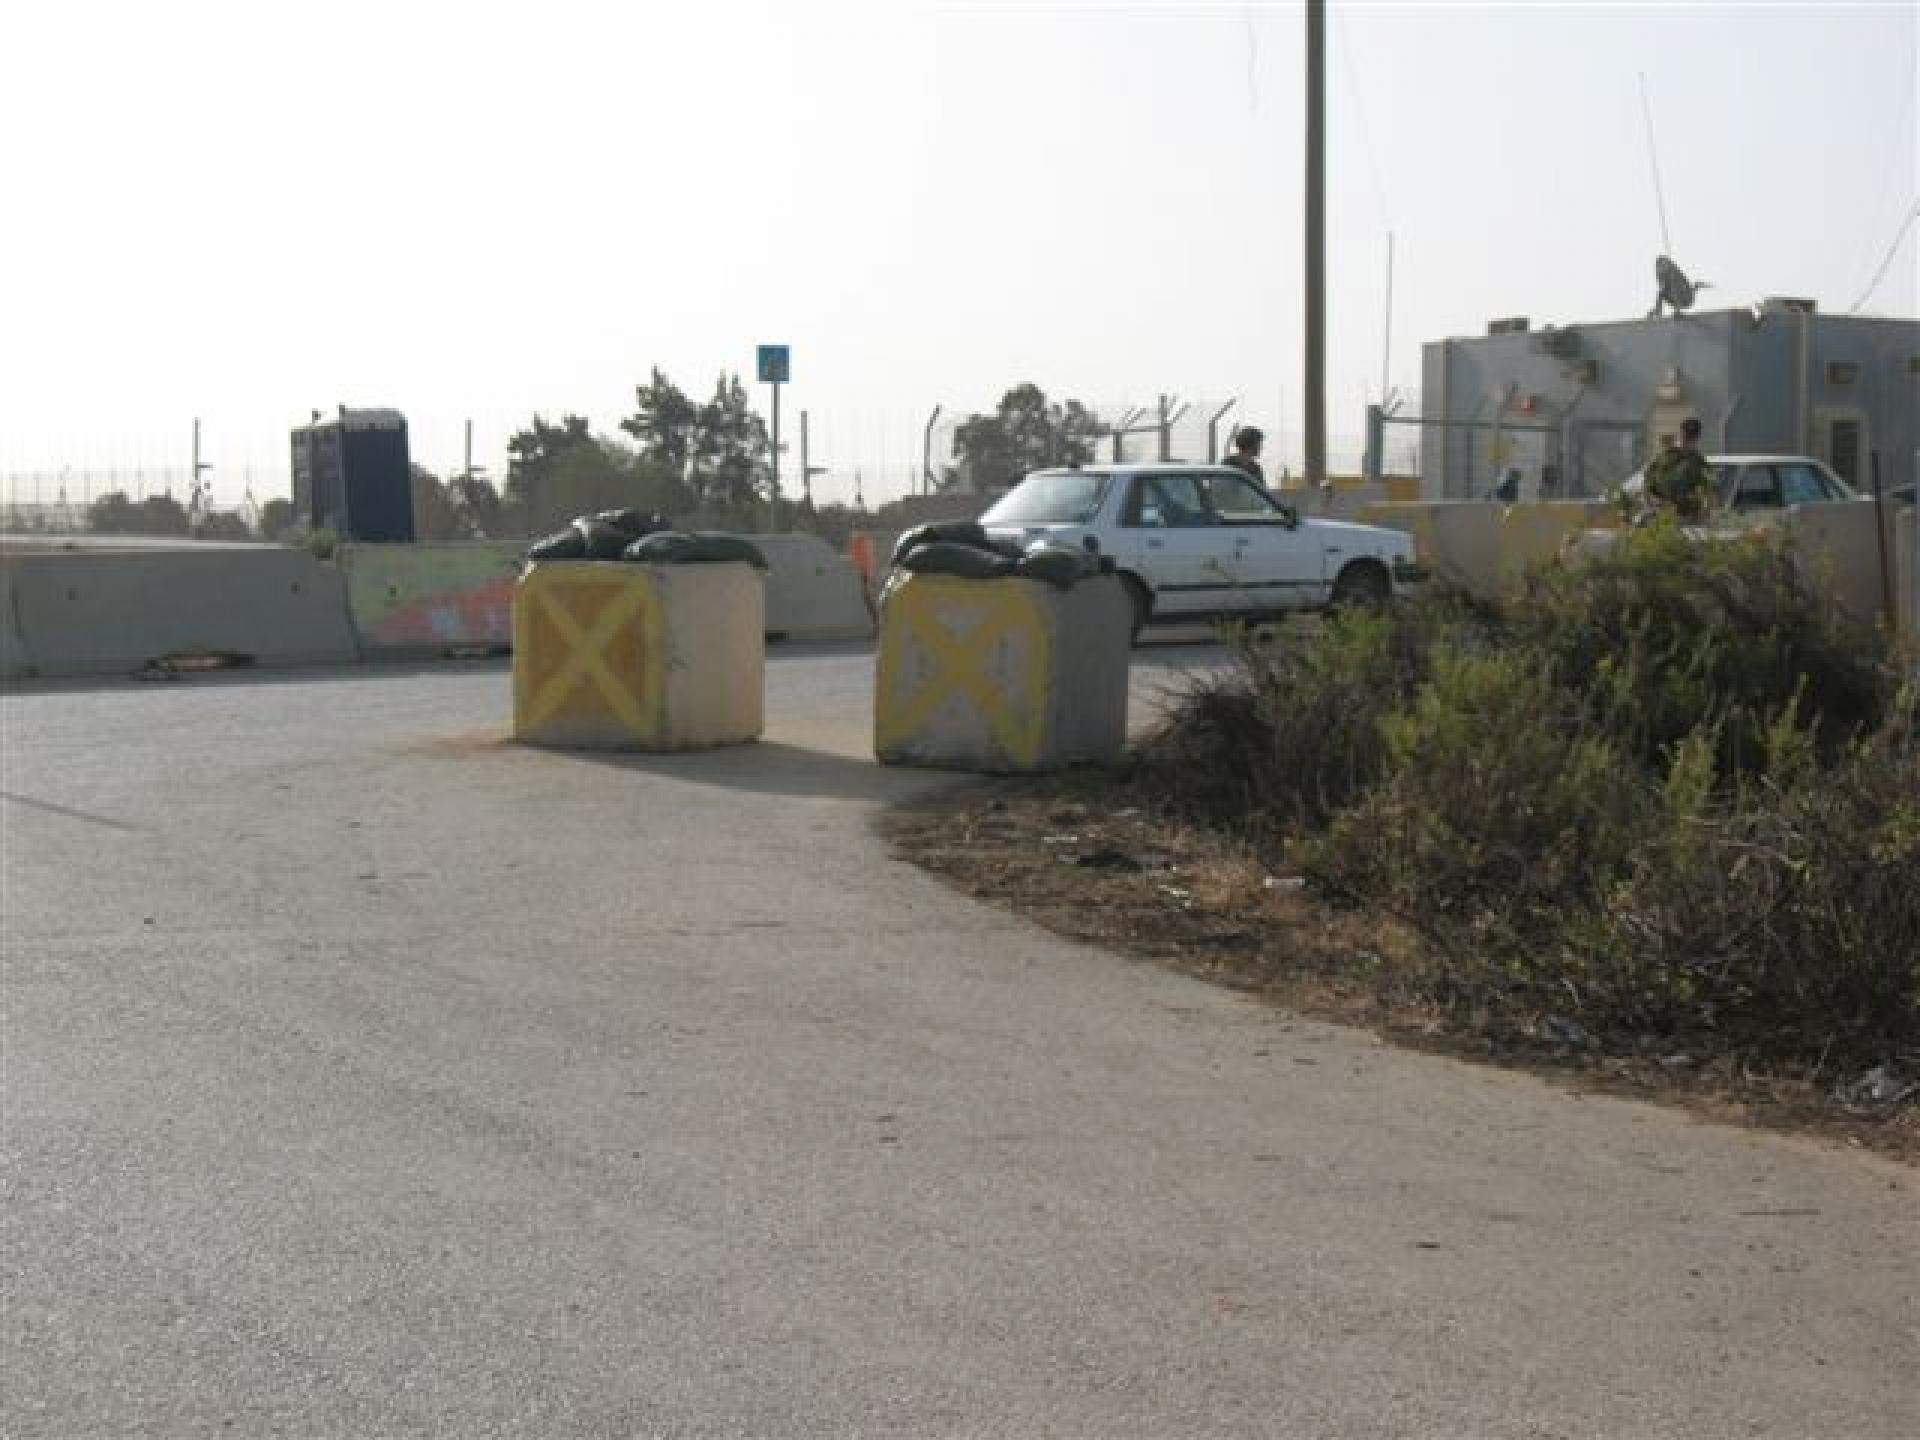 Tura/Shaked checkpoint 16.10.10